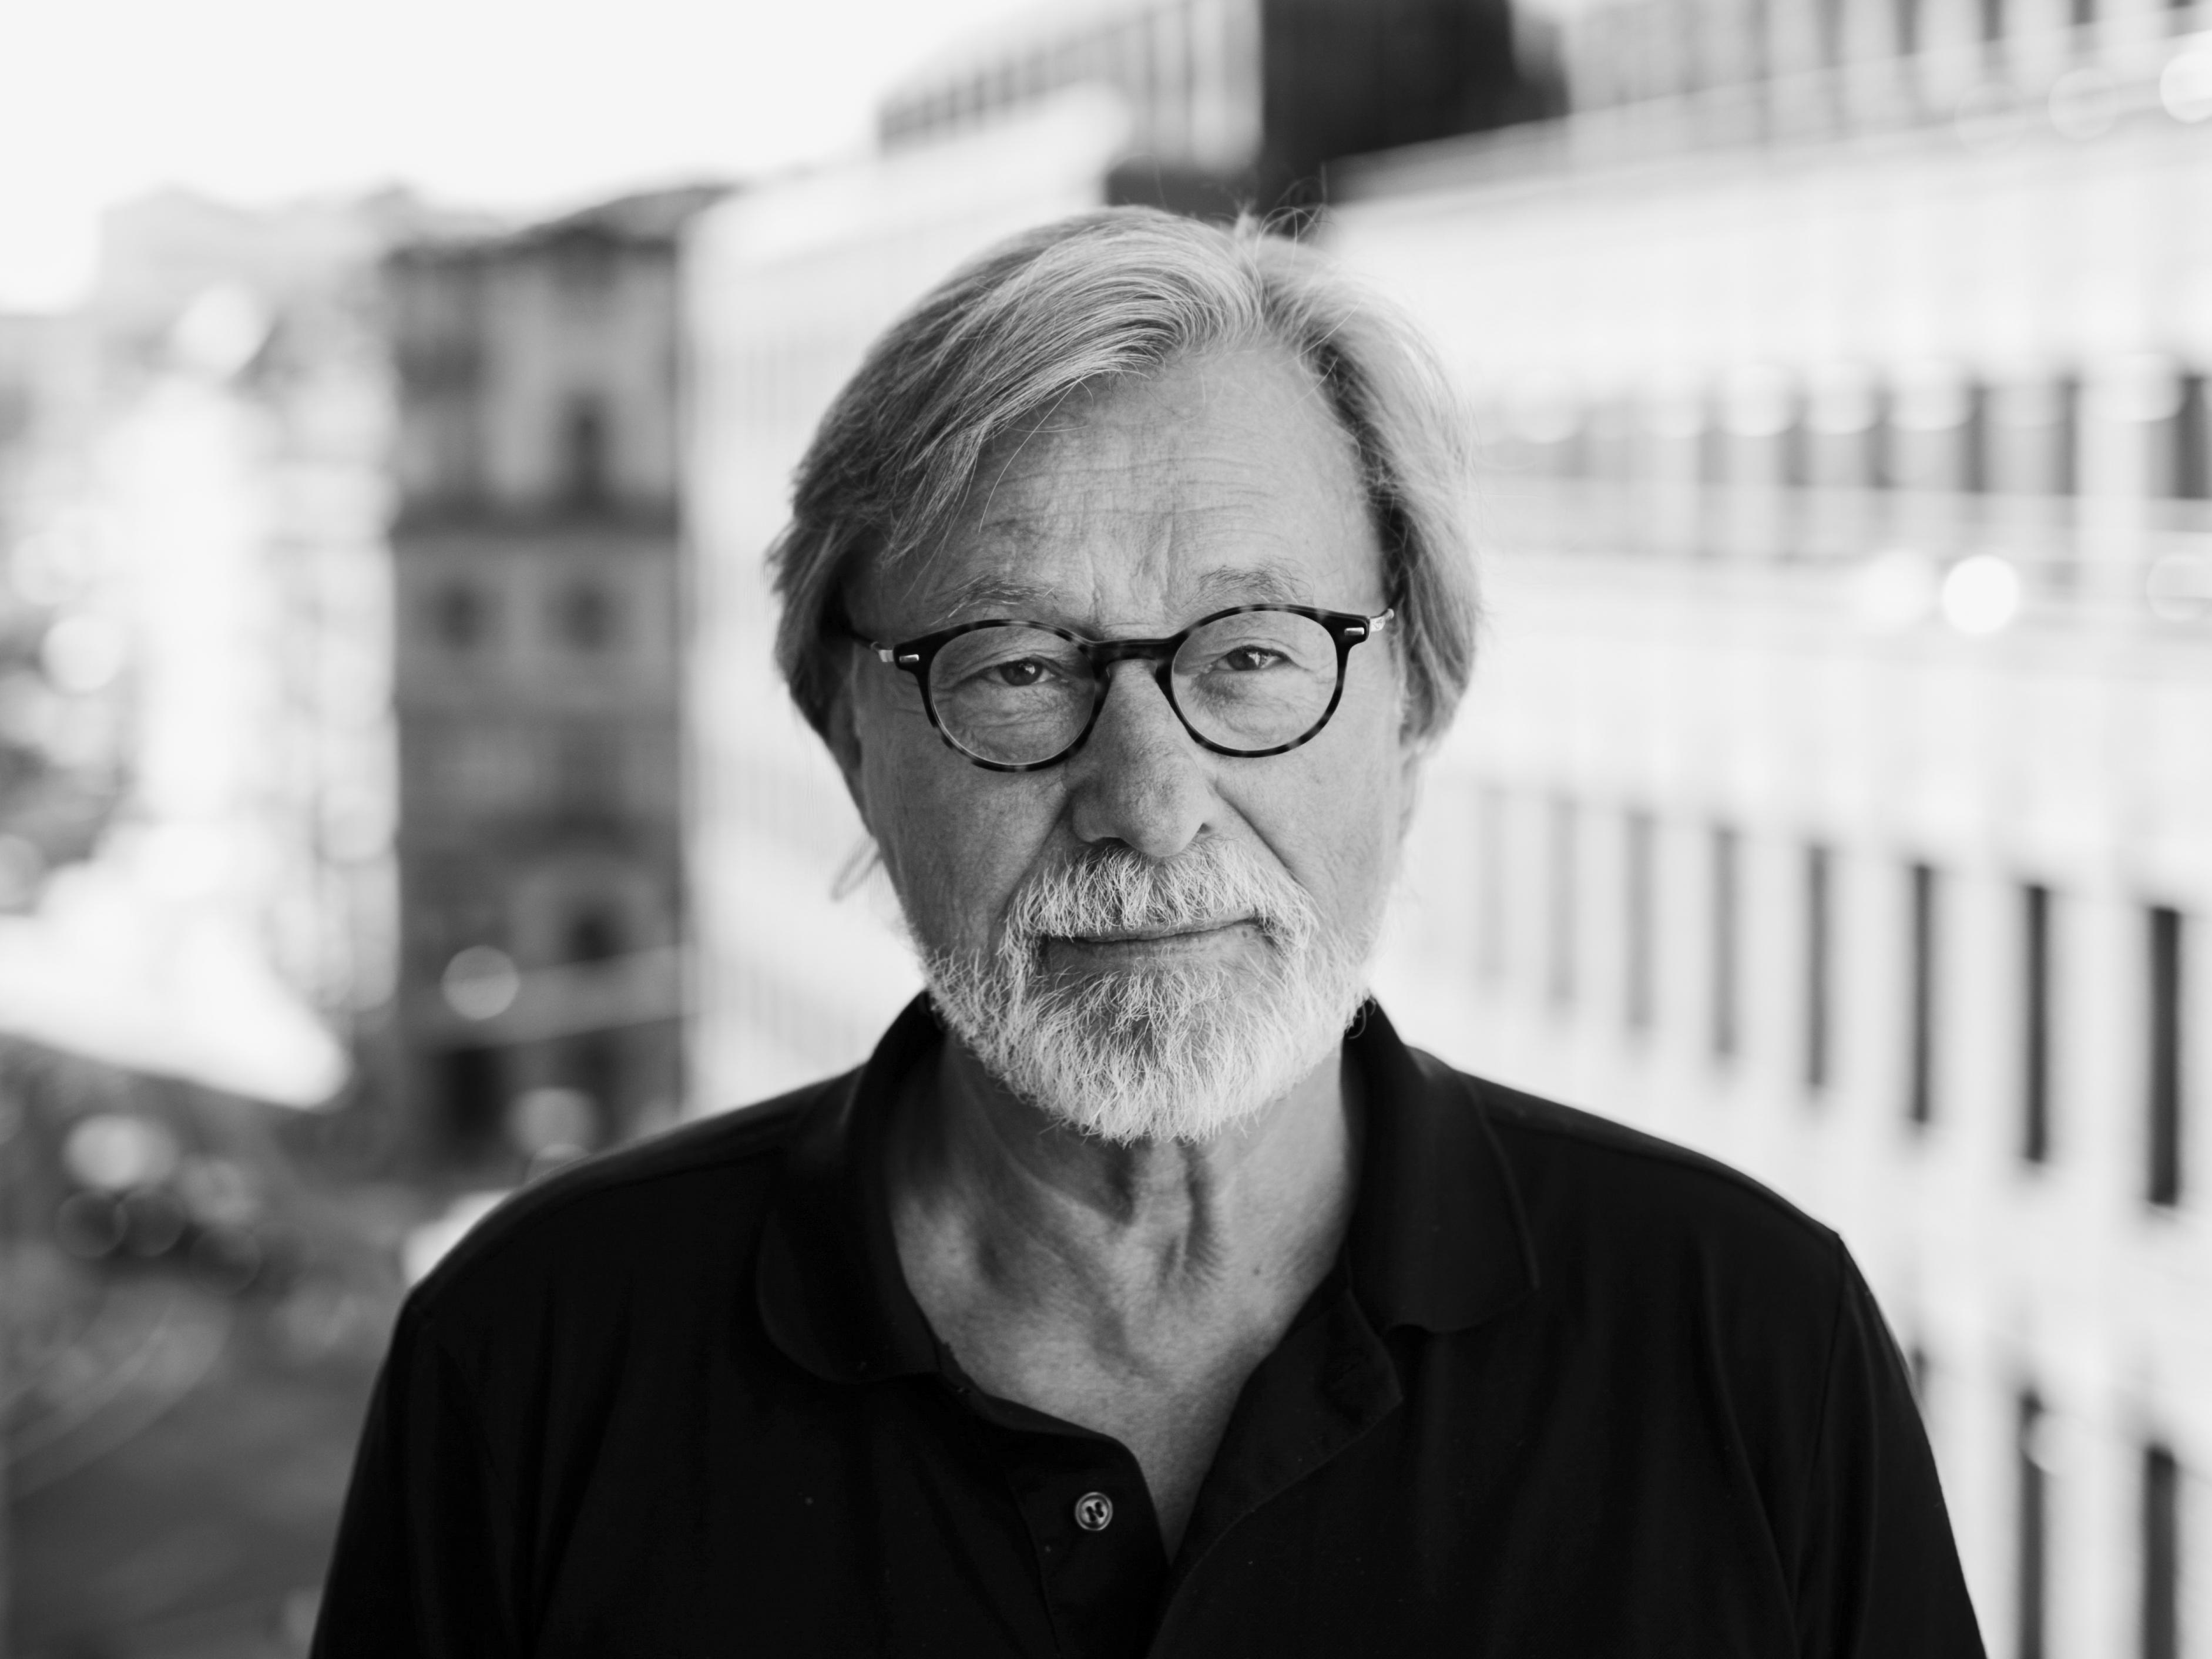 20150818 Stockholm Björn Rosengren  Foto: Oskar Omne